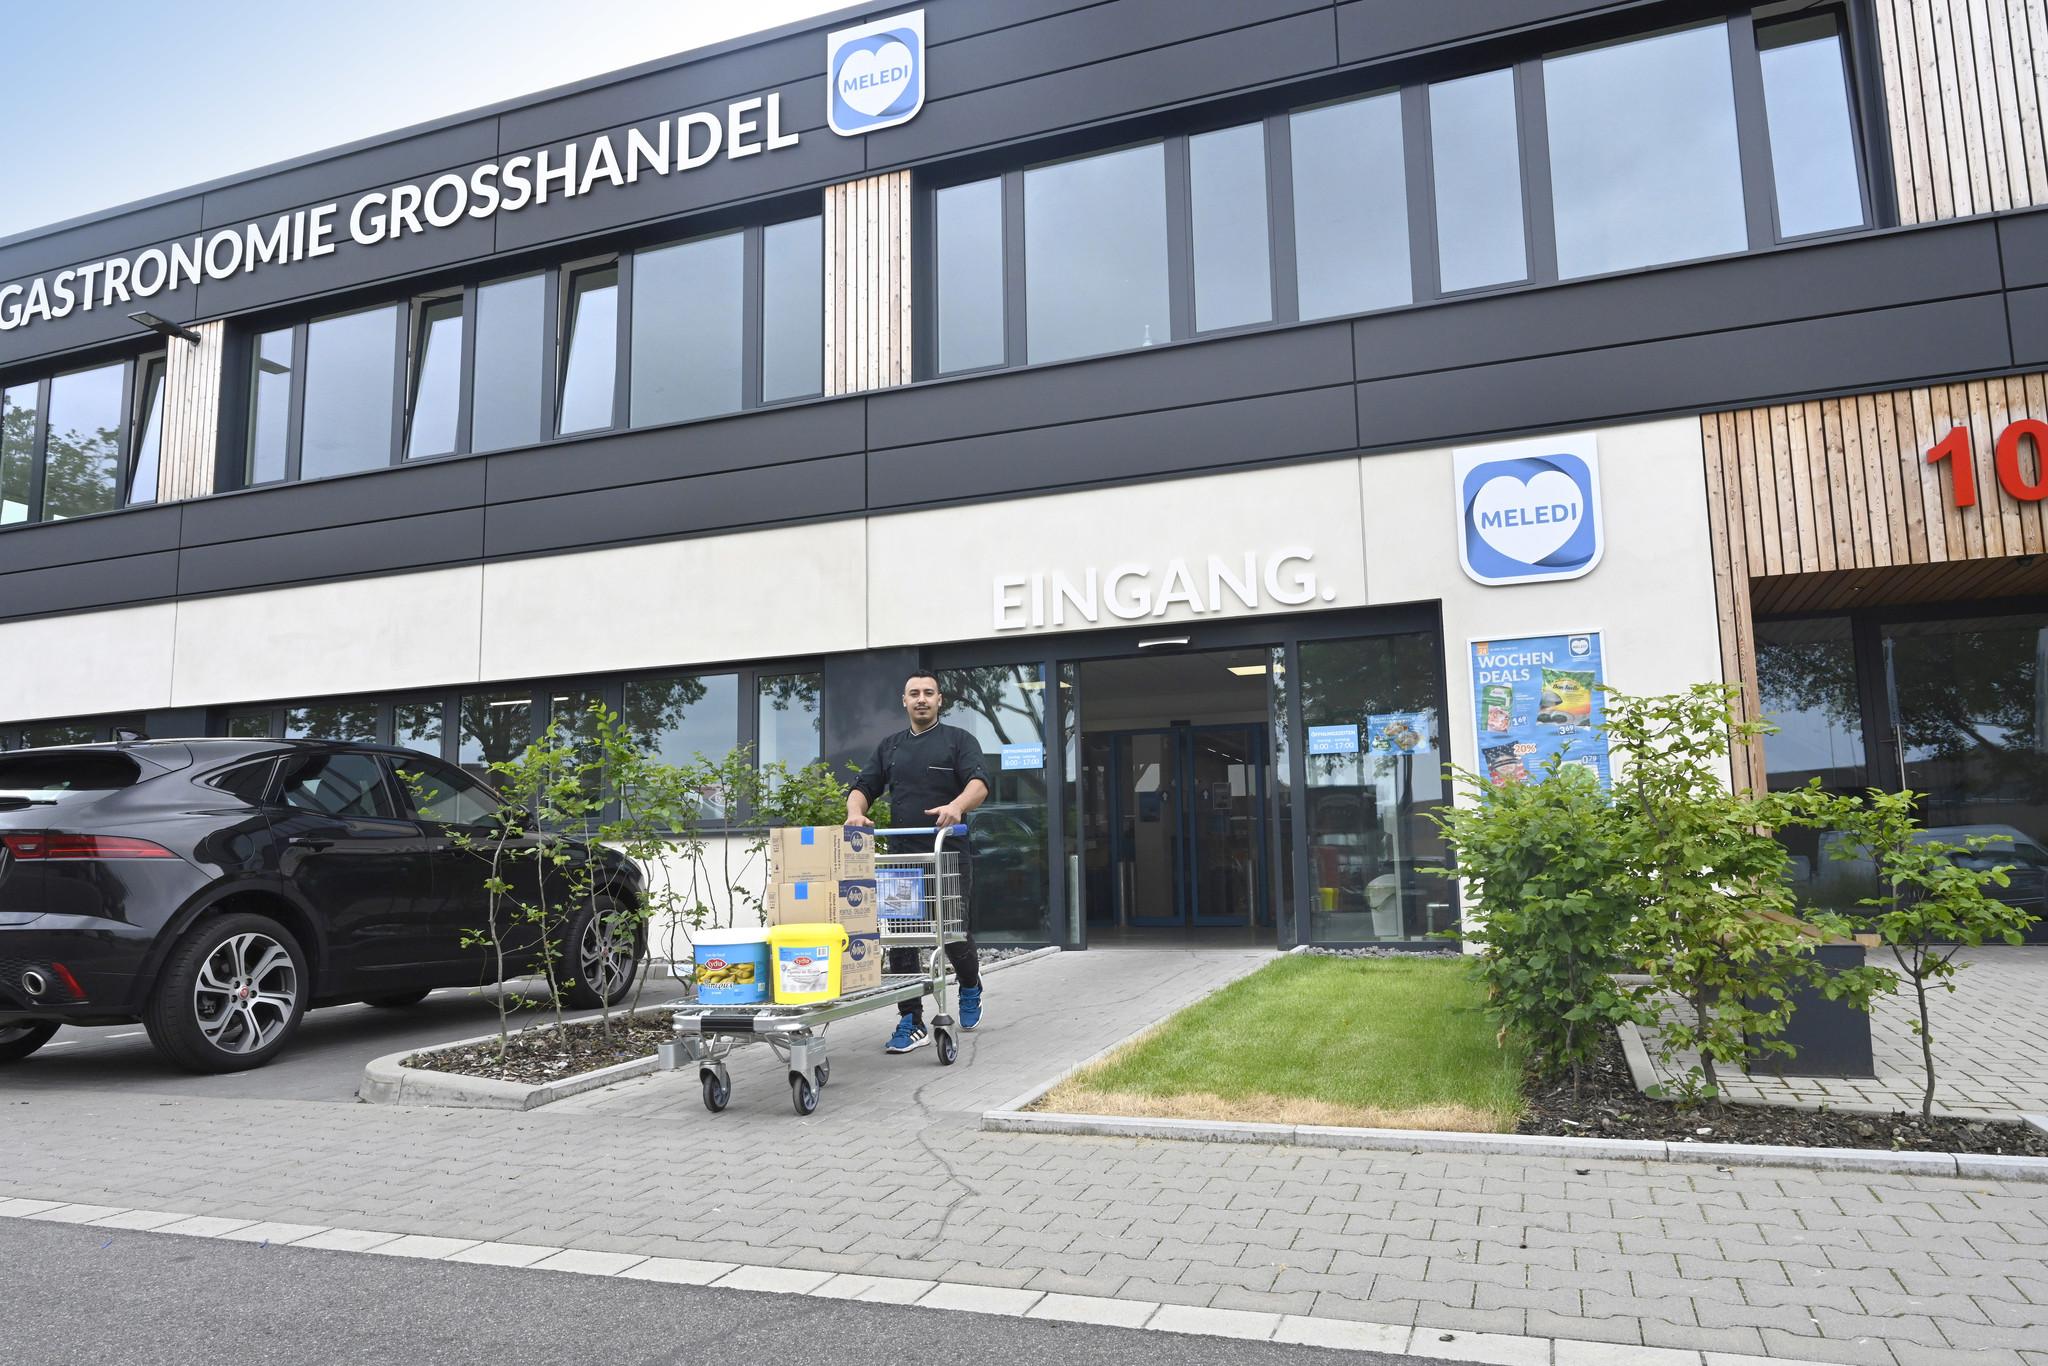 MELEDI dusseldorf GmbH